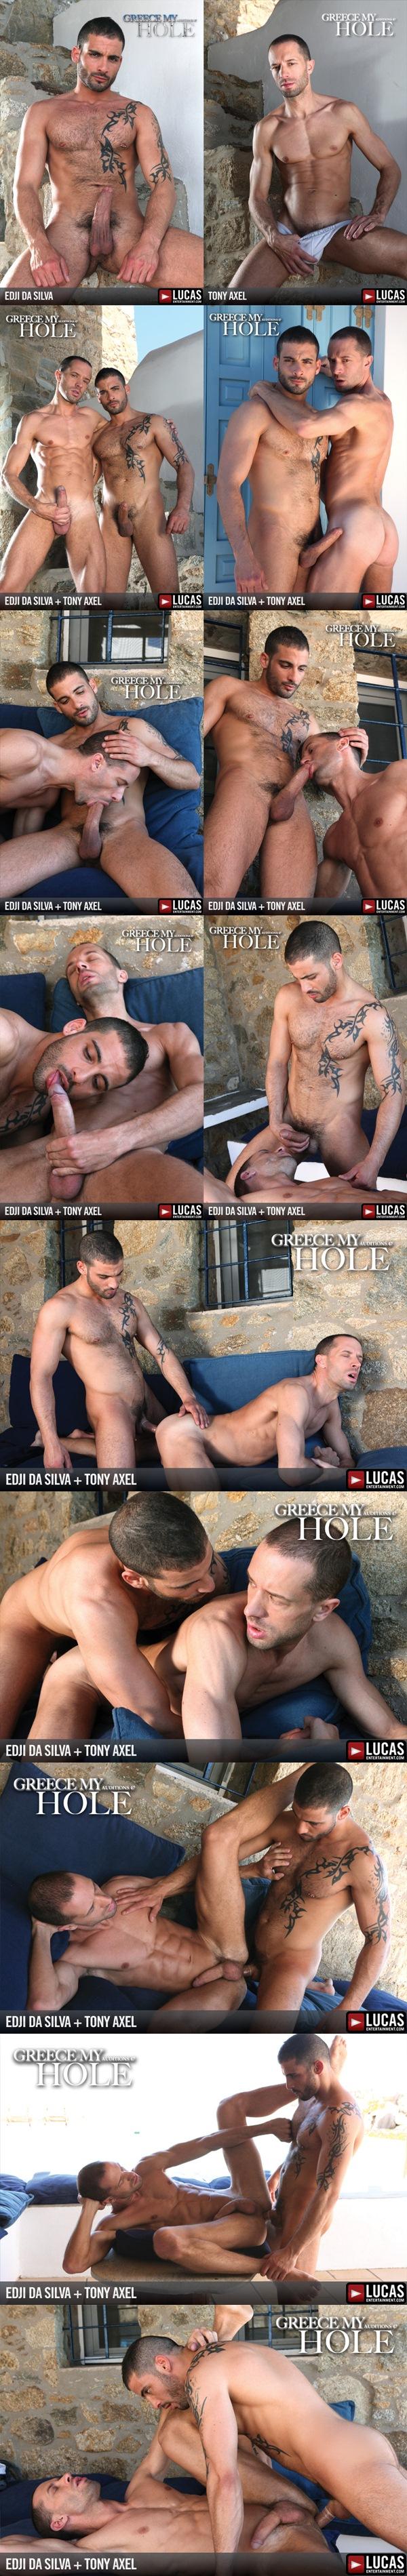 Masculine Edi Da Silva power-fucks handsome Tony Axel at Lucasentertainment 01